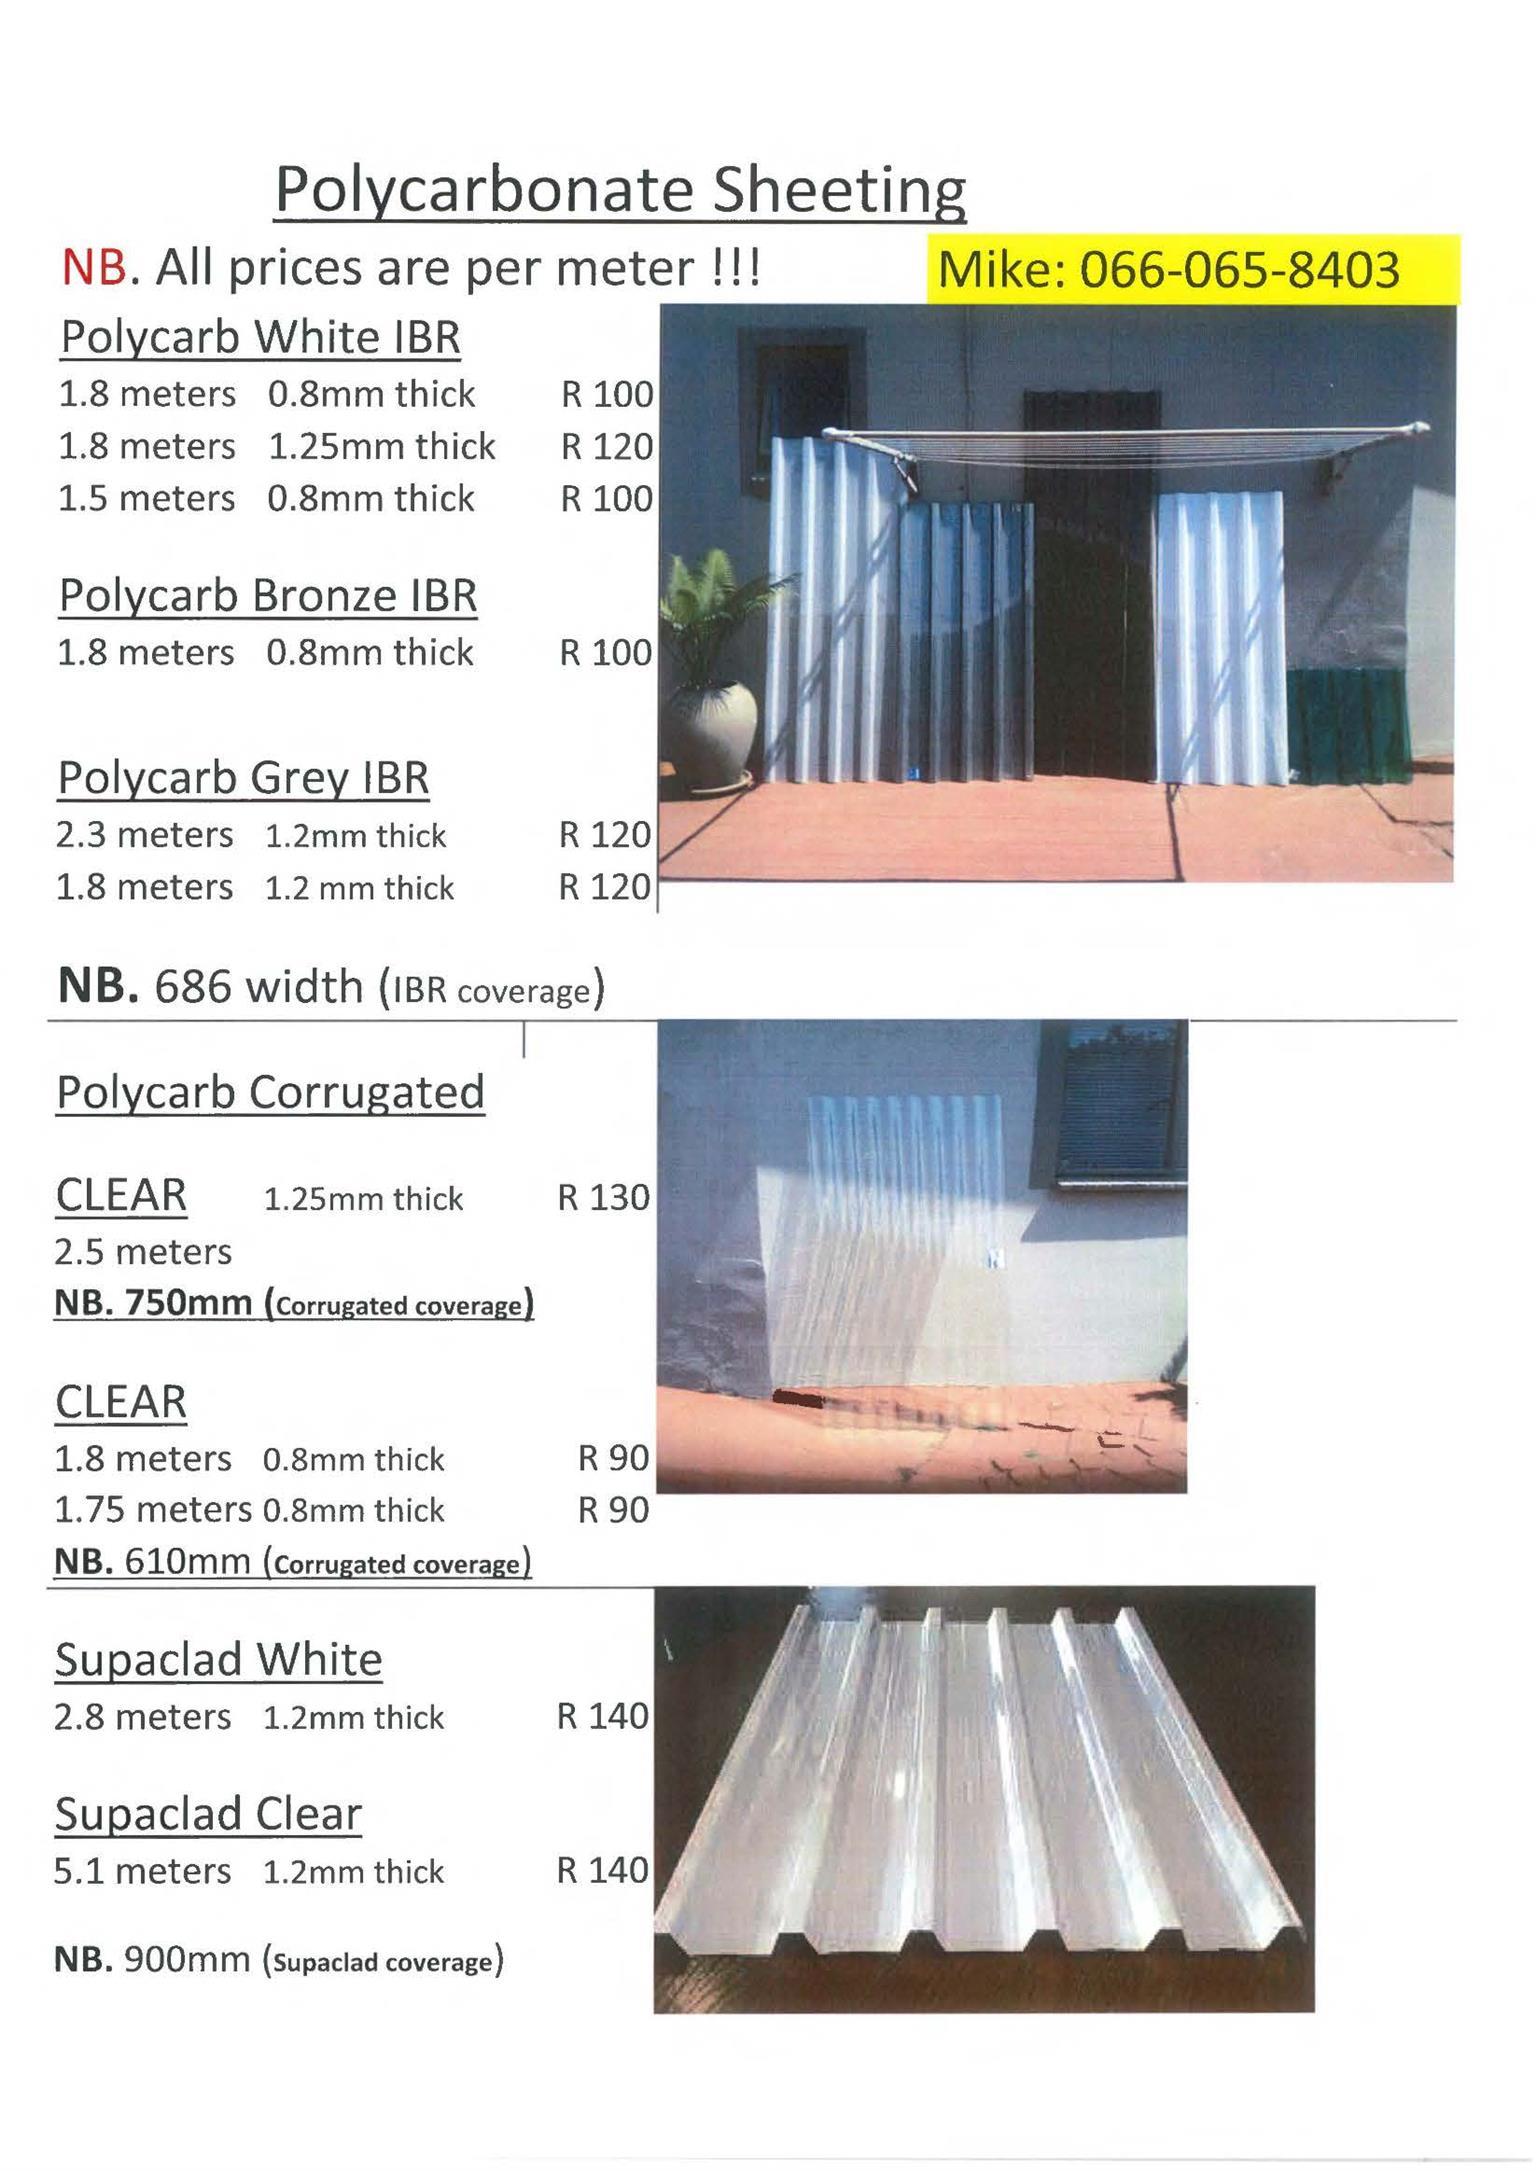 Polycarbonate Sheeting. Fibre glass sheting